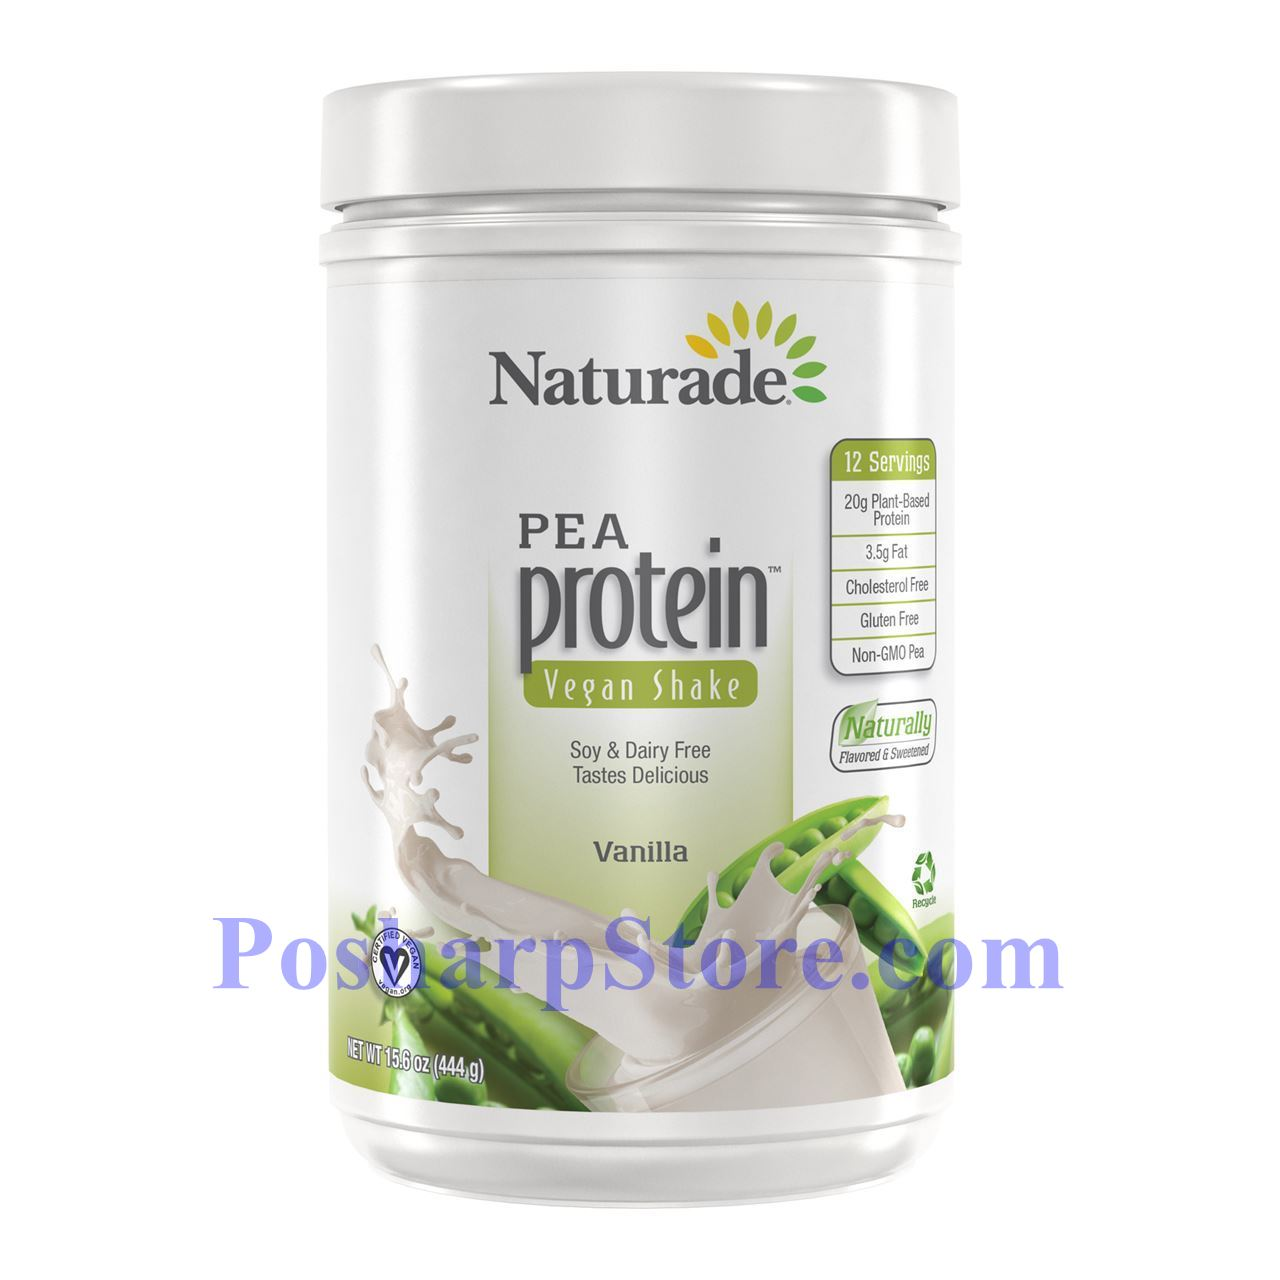 Picture for category Naturade Pea Protein Vegan Shake Vanilla Flavor 15.66 oz